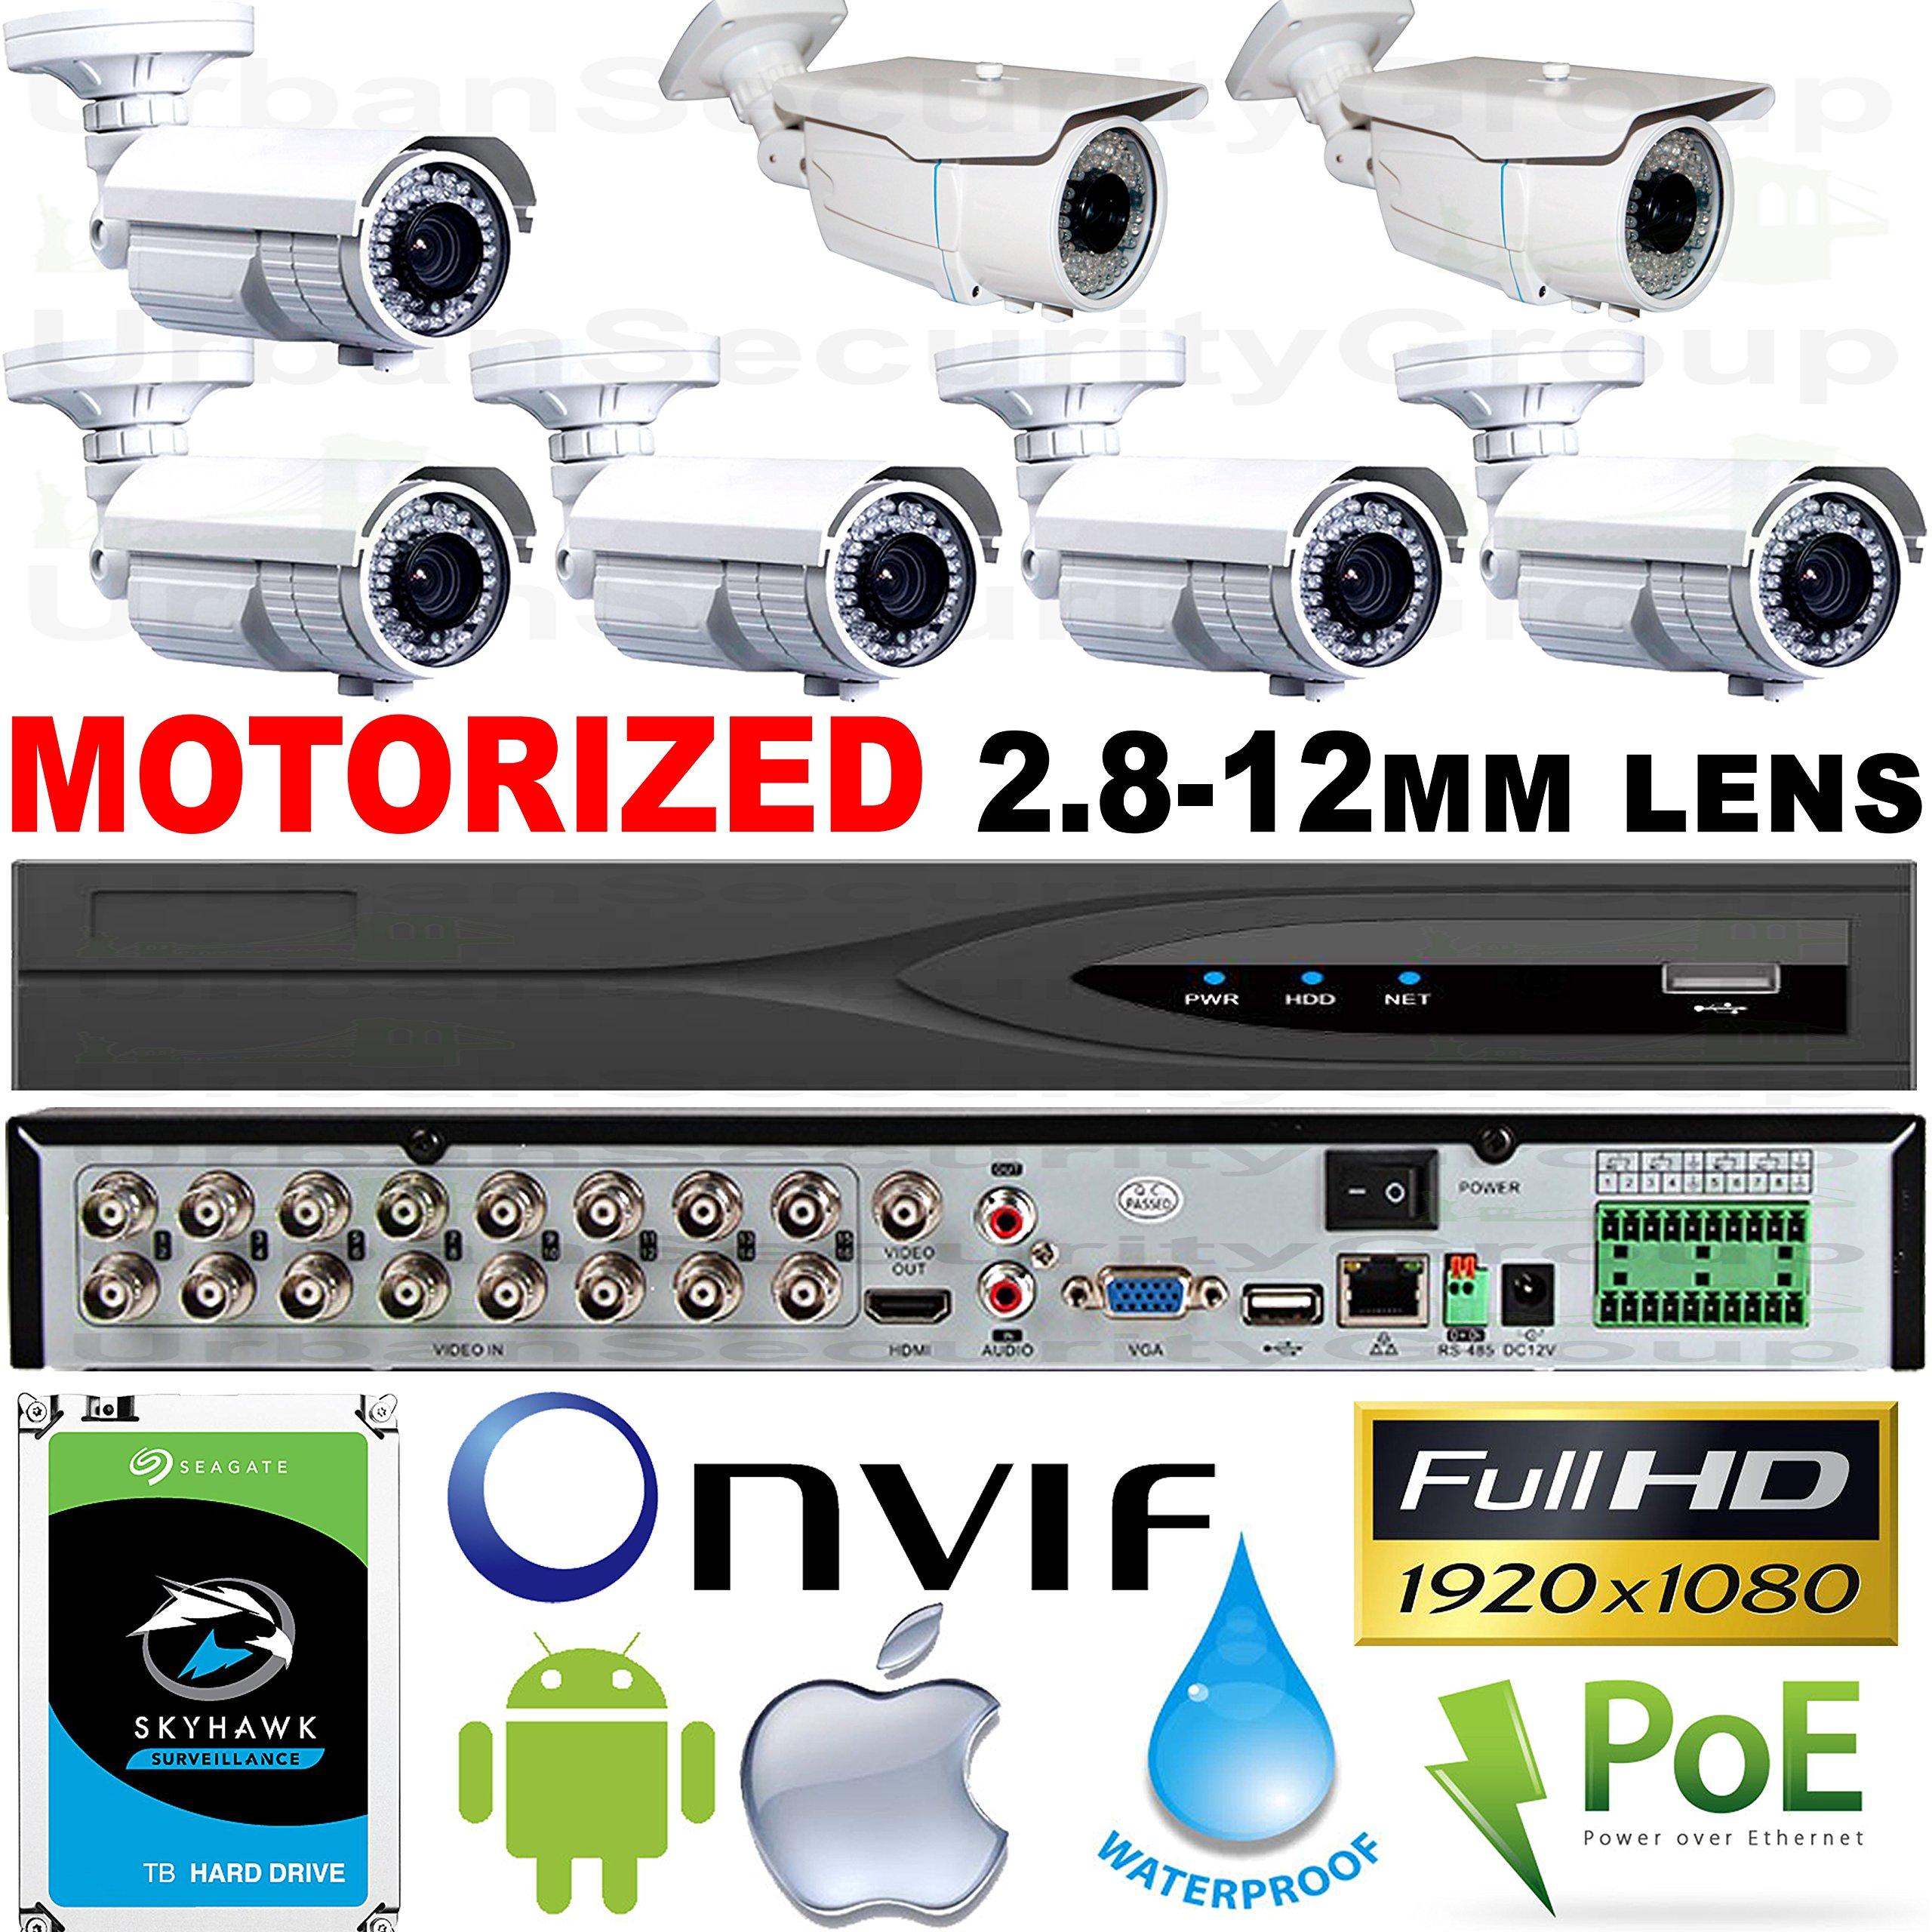 USG Business Grade 7 Camera Security System 1080P 2MP @ 30FPS HD-TVI : 5x Motorized Auto-Focus 2.8-12mm & 2x Manual 2.8-12mm Vari-focal Lens Bullet Cameras + 1x 16 Channel DVR + 1x 4TB HD